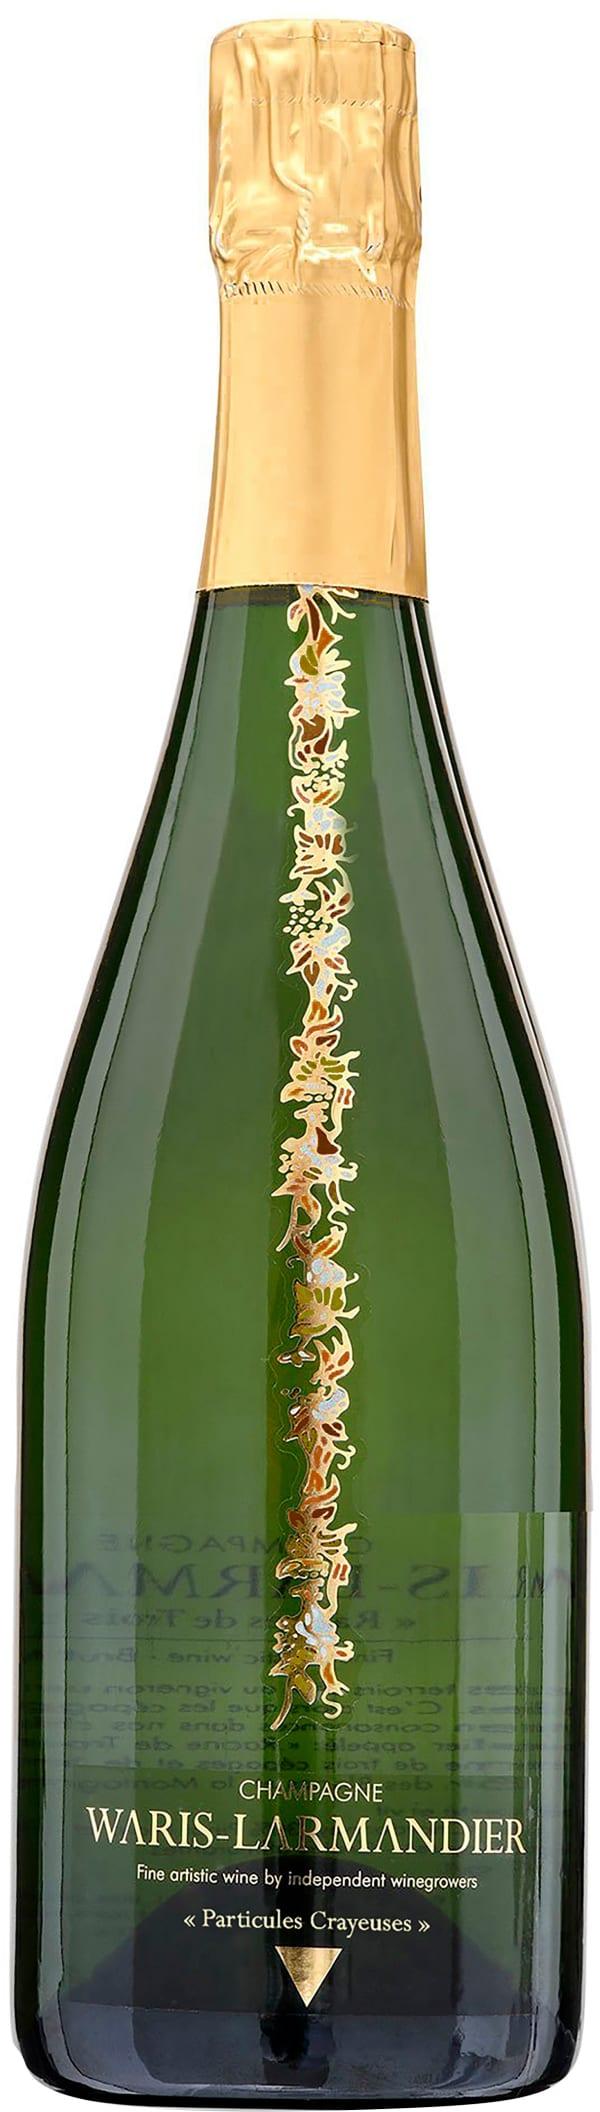 Waris-Larmandier Particules Crayeuses Champagne Extra-Brut